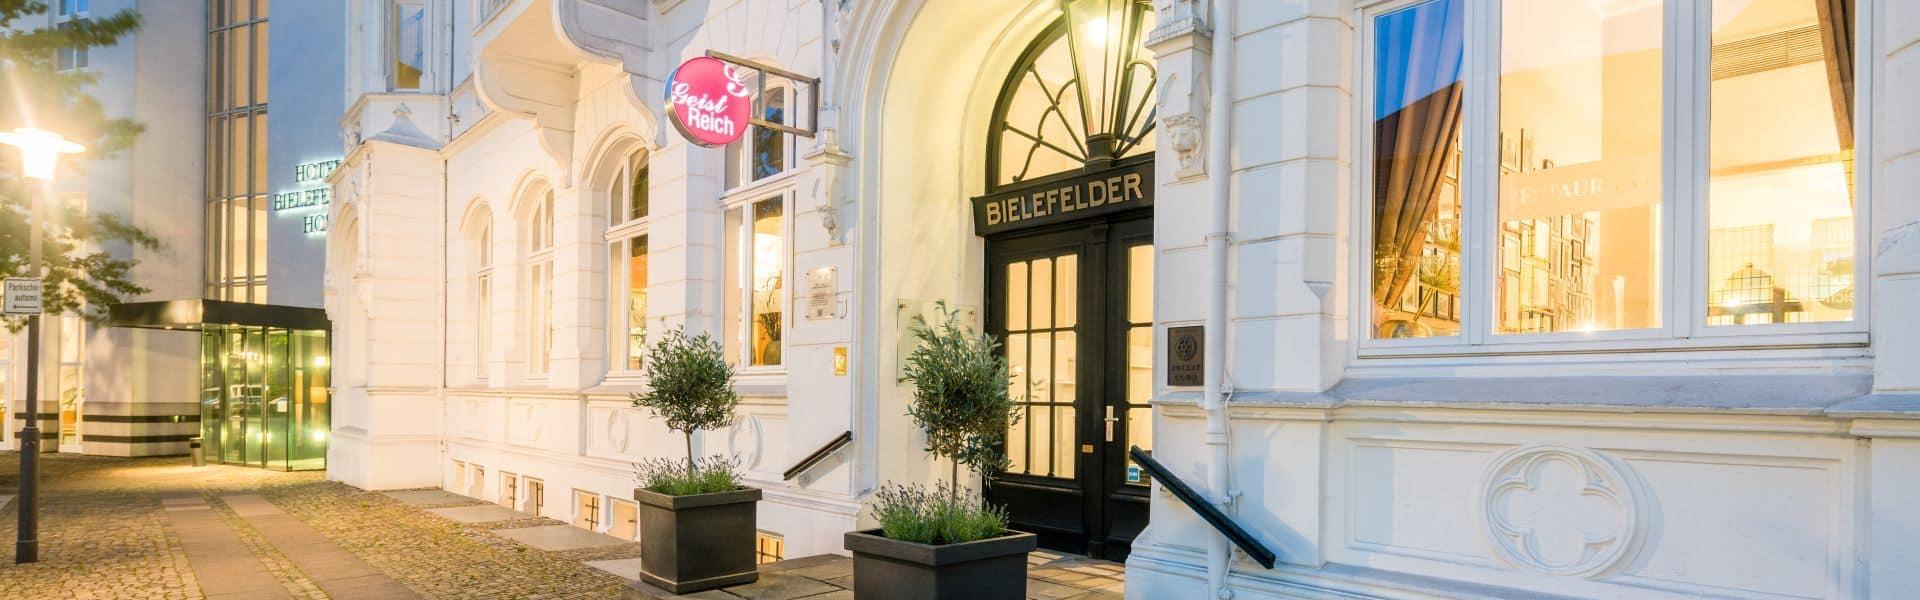 Hotel Bielefelder Hof in Bielefeld, Duitsland